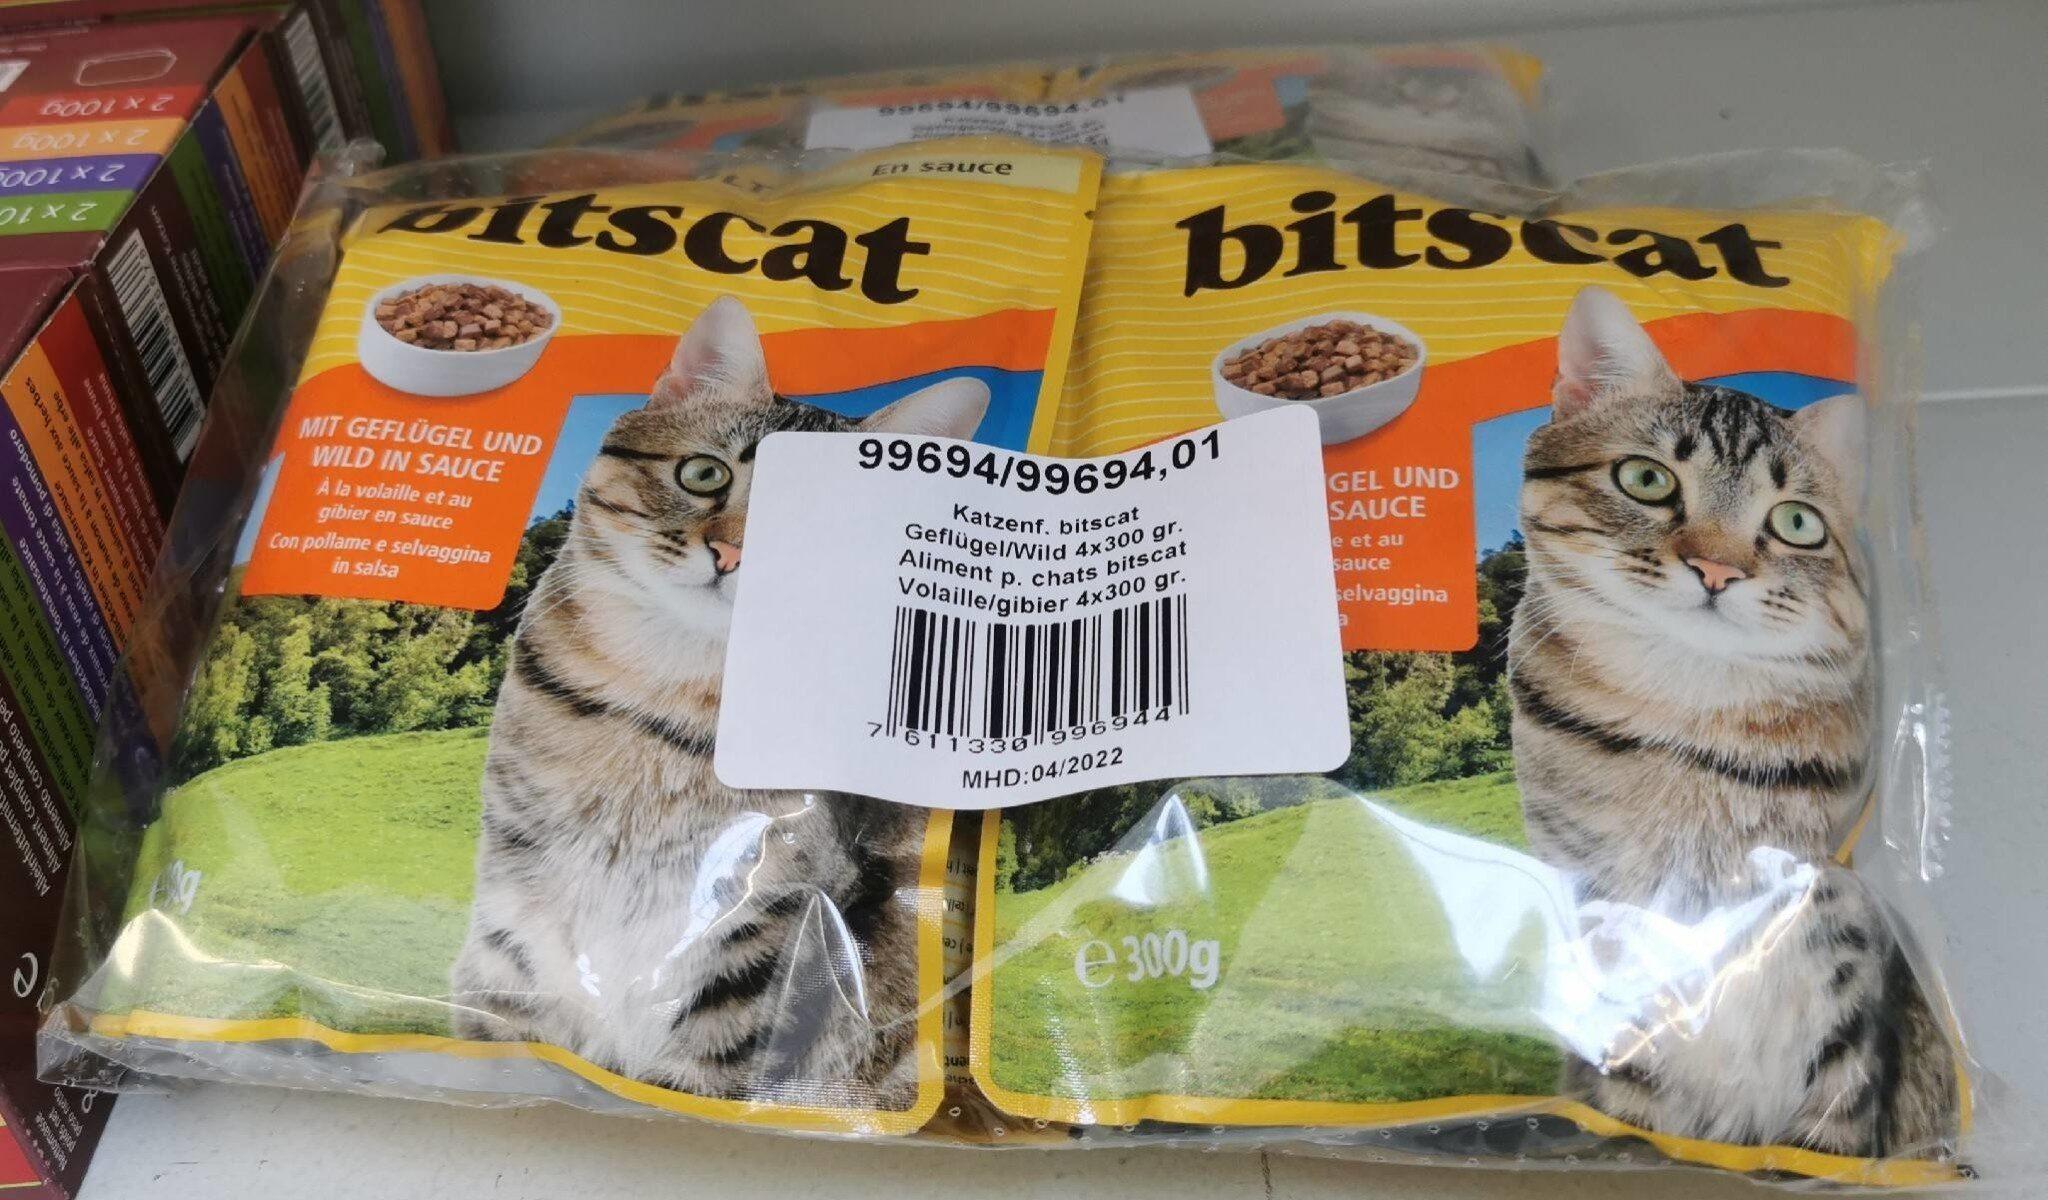 Bitscat - Product